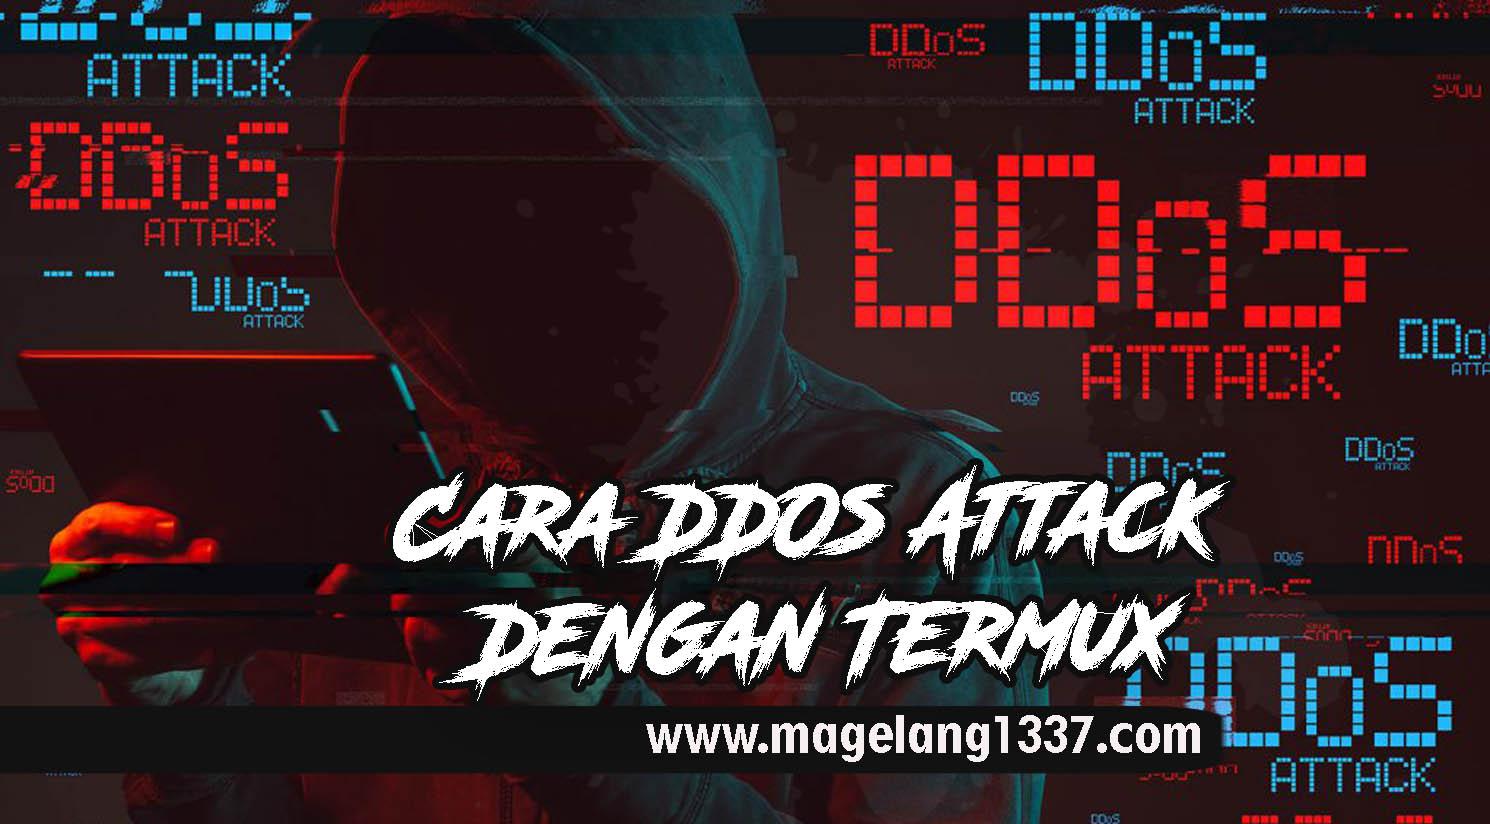 Cara DDOs Attack Dengan Termux | 100% Work - MNH-BLOG